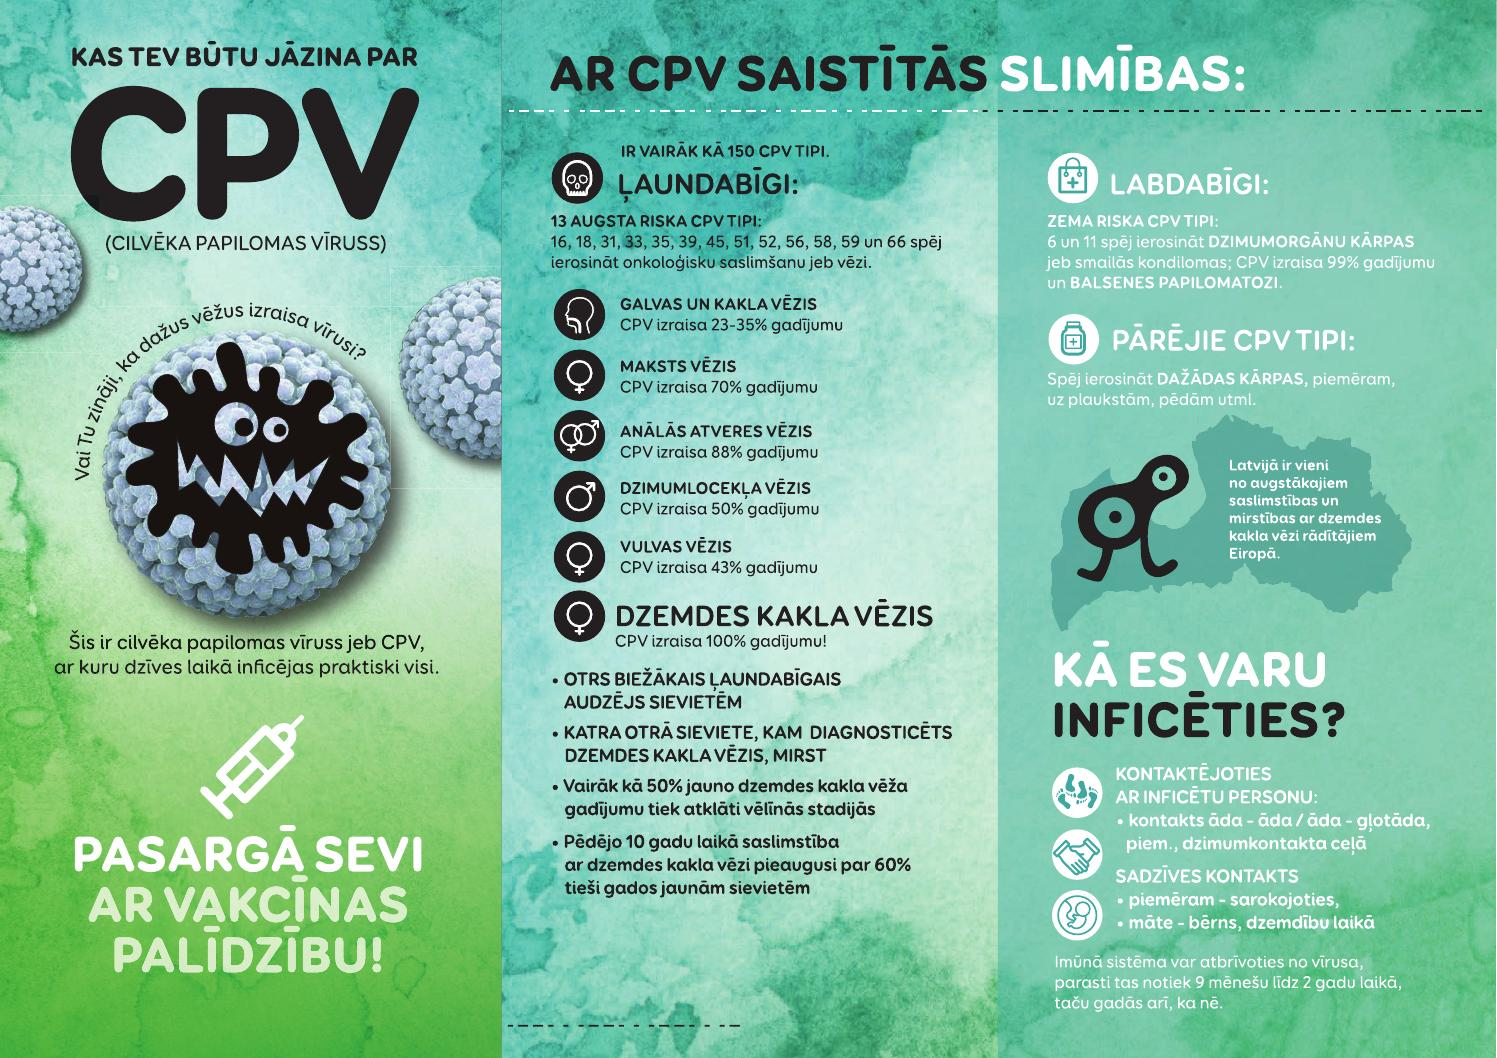 cilveka papillomas viruss does hpv type 16 18 cause warts